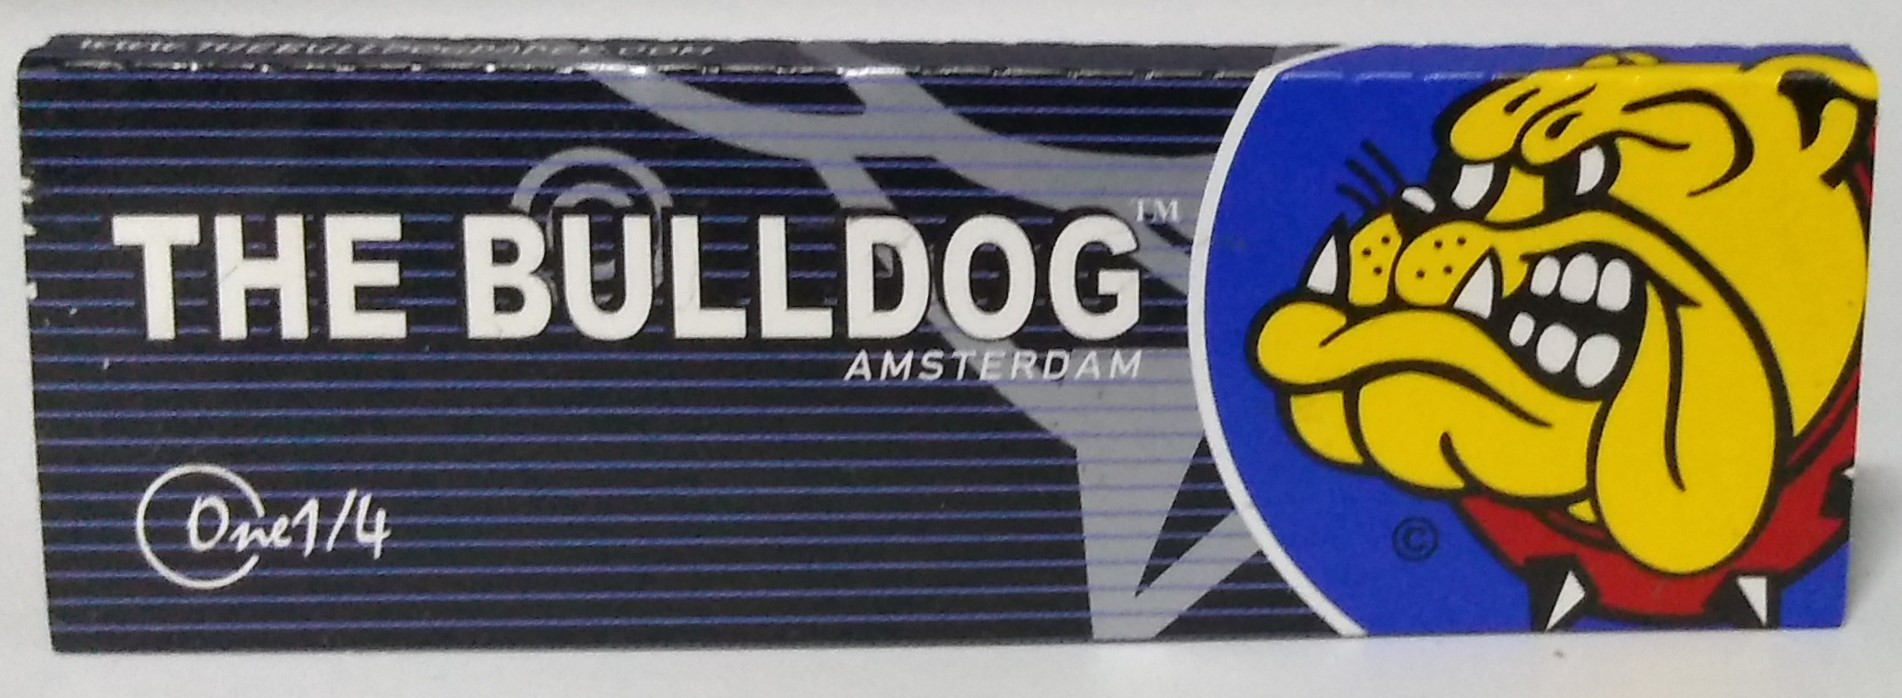 Papel The Bulldog Black 1.1/4